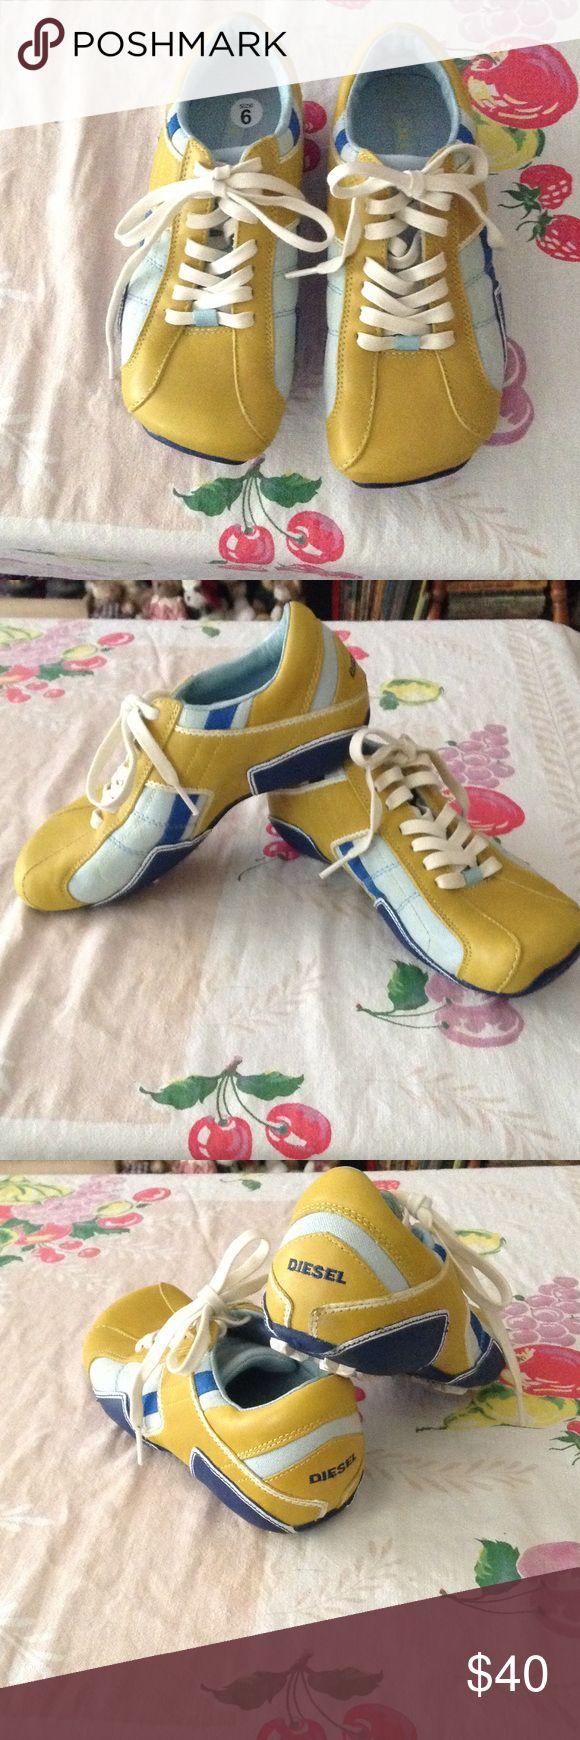 🆕DIESEL Sneakers Shoes 💙☀️🐳✈️🌟 NWOT! Leather Sneaker Shoe in Golden Yellow, Sky Blue, Ocean Blue, Dark Blue, and White. Never Worn Diesel Brand Size 6 Diesel Shoes